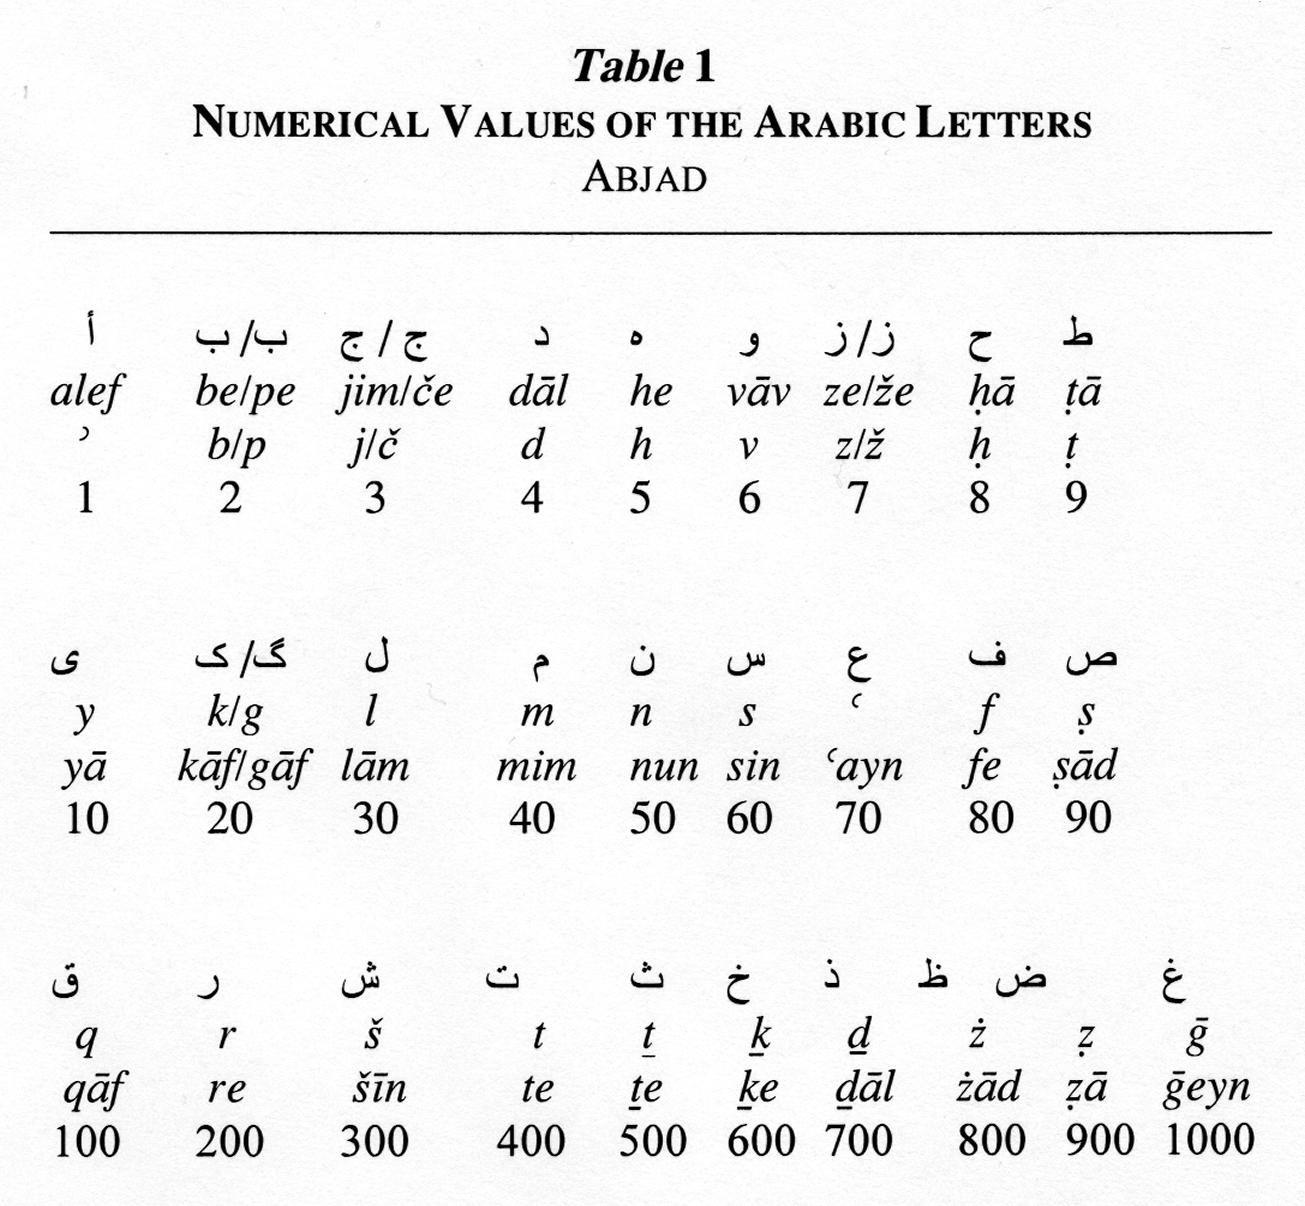 Jafr encyclopaedia iranica magick symbols signs sigils jafr encyclopaedia iranica biocorpaavc Gallery